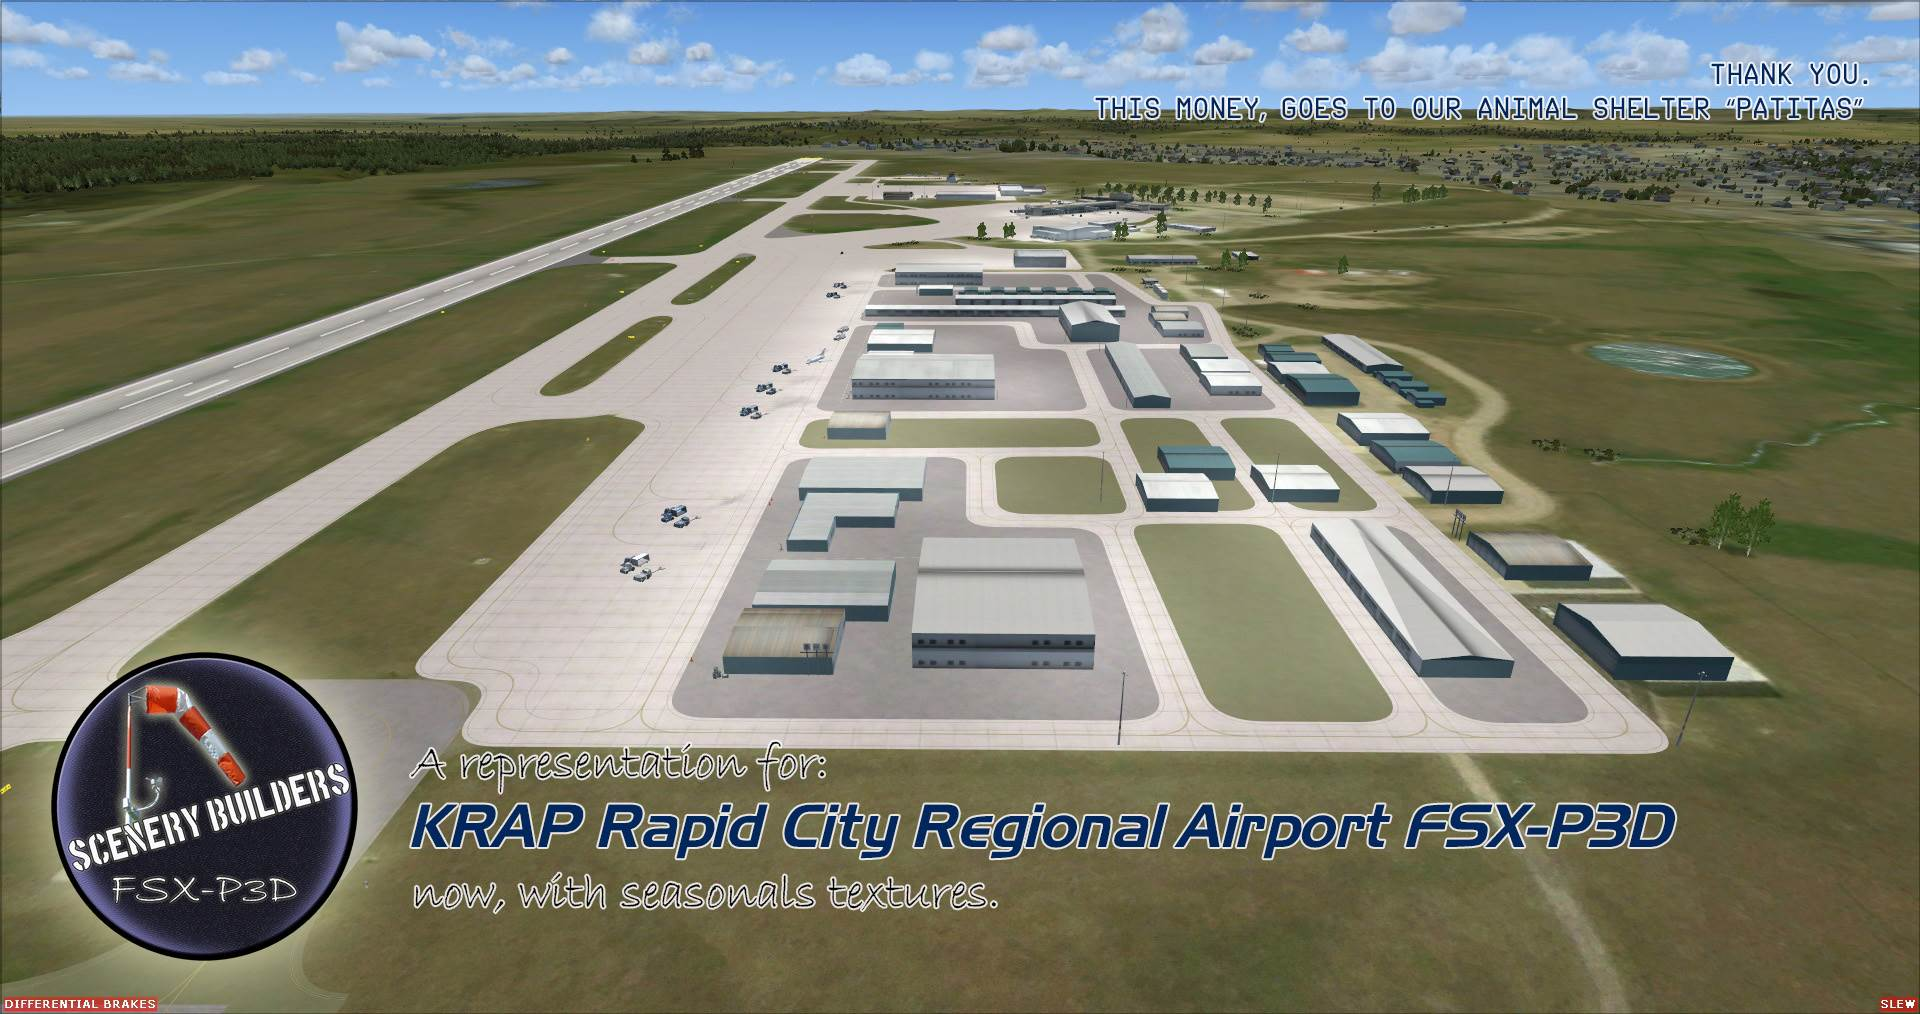 Rapid City Regional Airport Krap